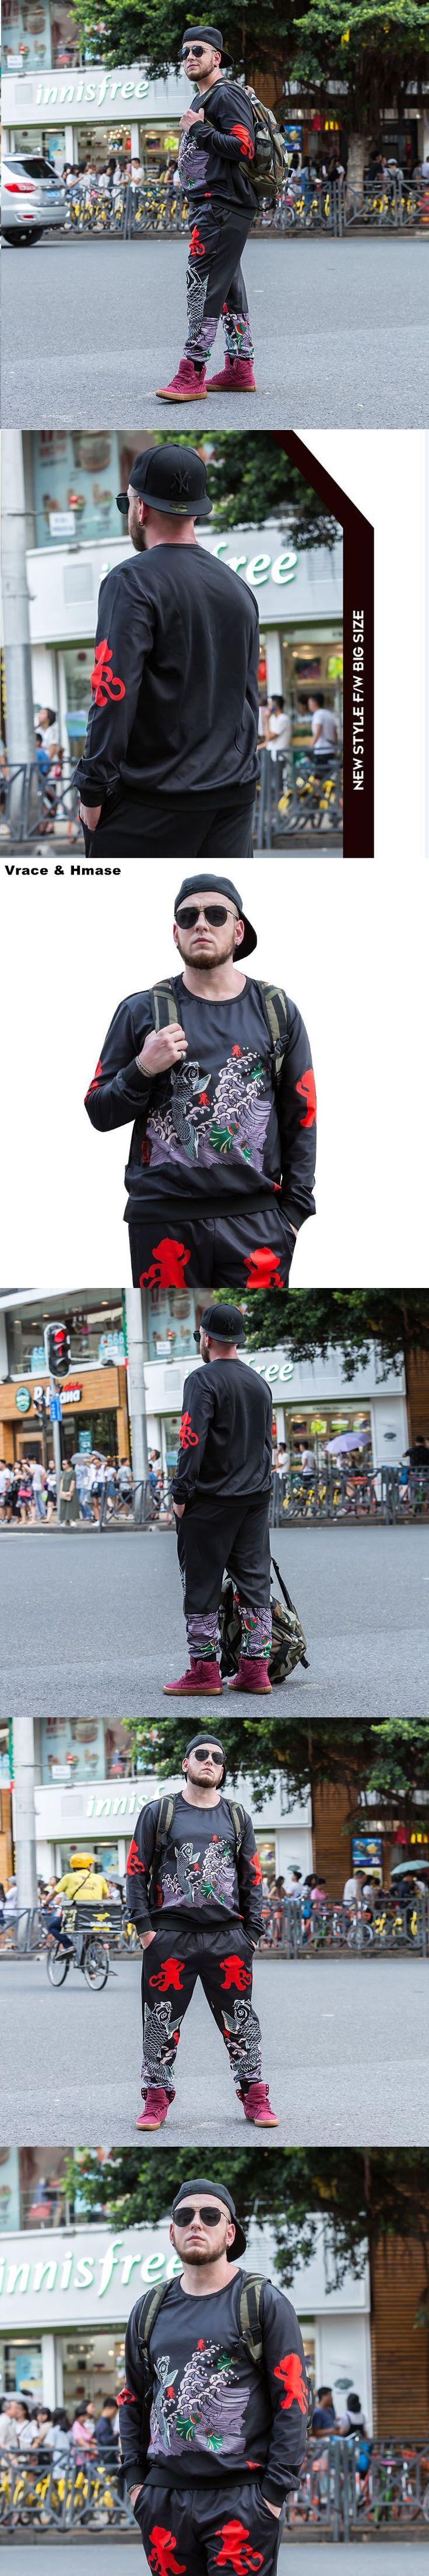 Chinese style cartoon monkey printing fashion oversized sweatshirt Autumn&Winter 2017 New top quality warm sweatshirt men XL-6XL